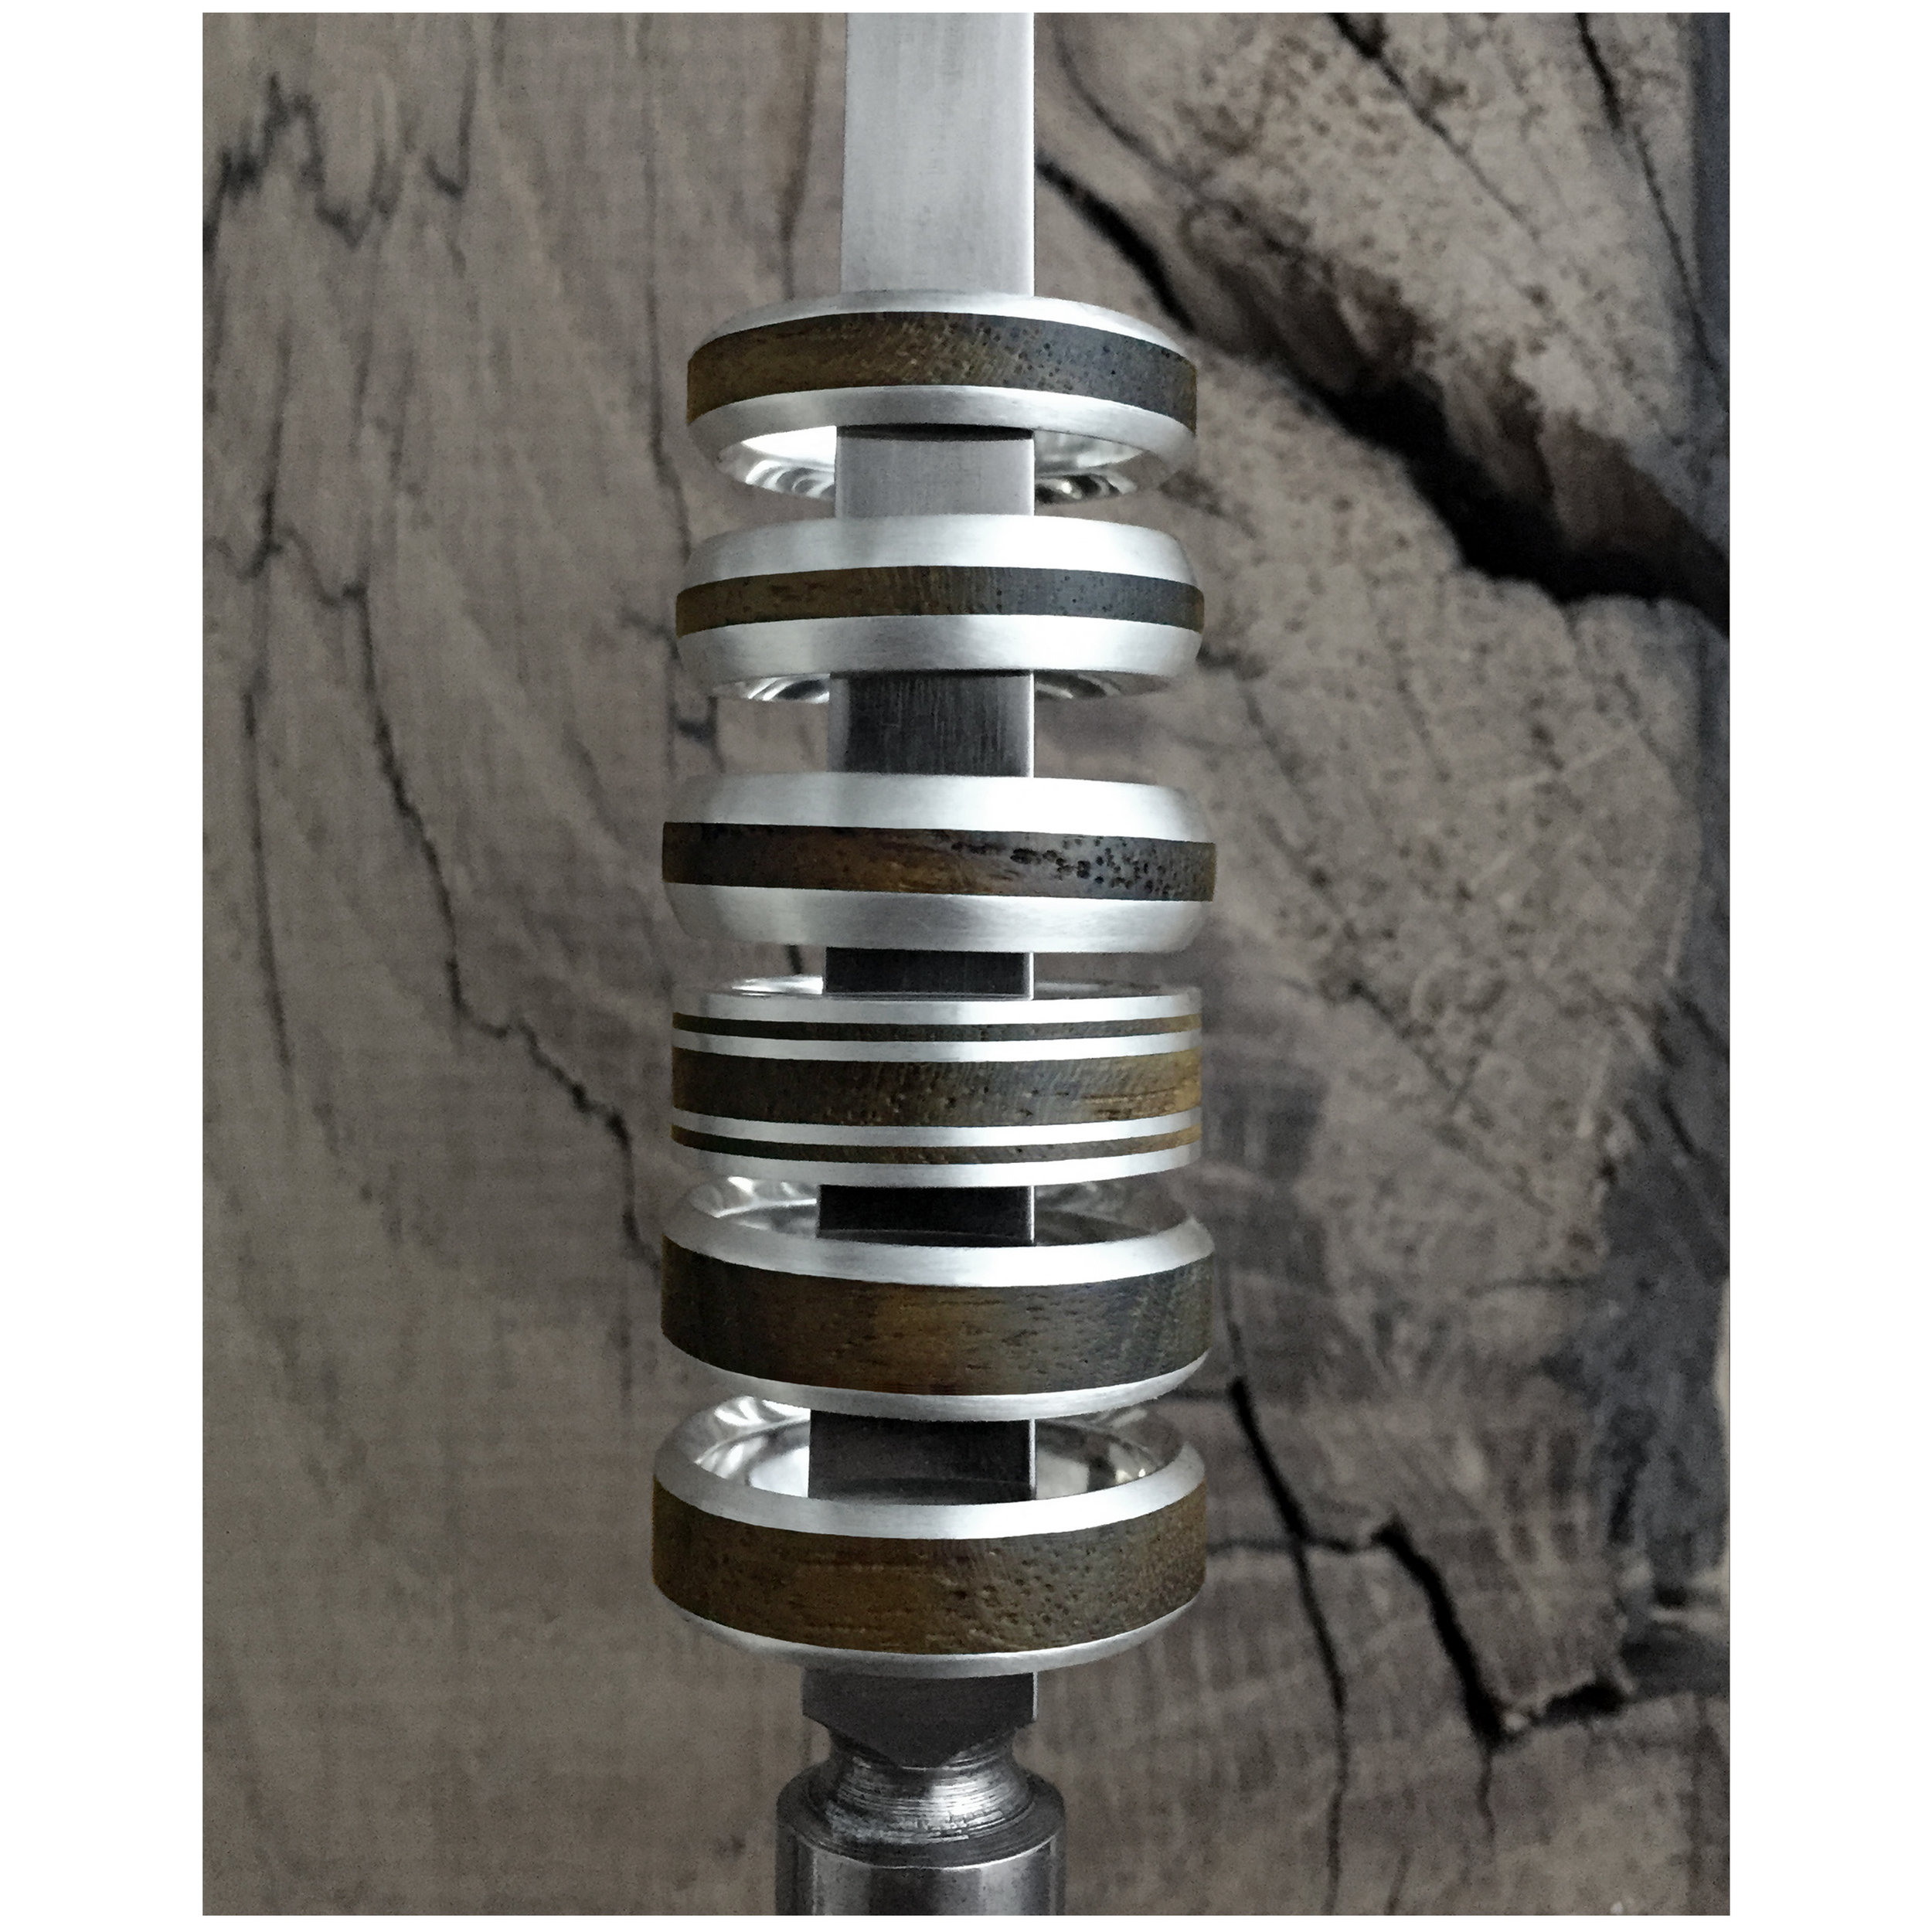 cutty-sark-wood-rings.jpg